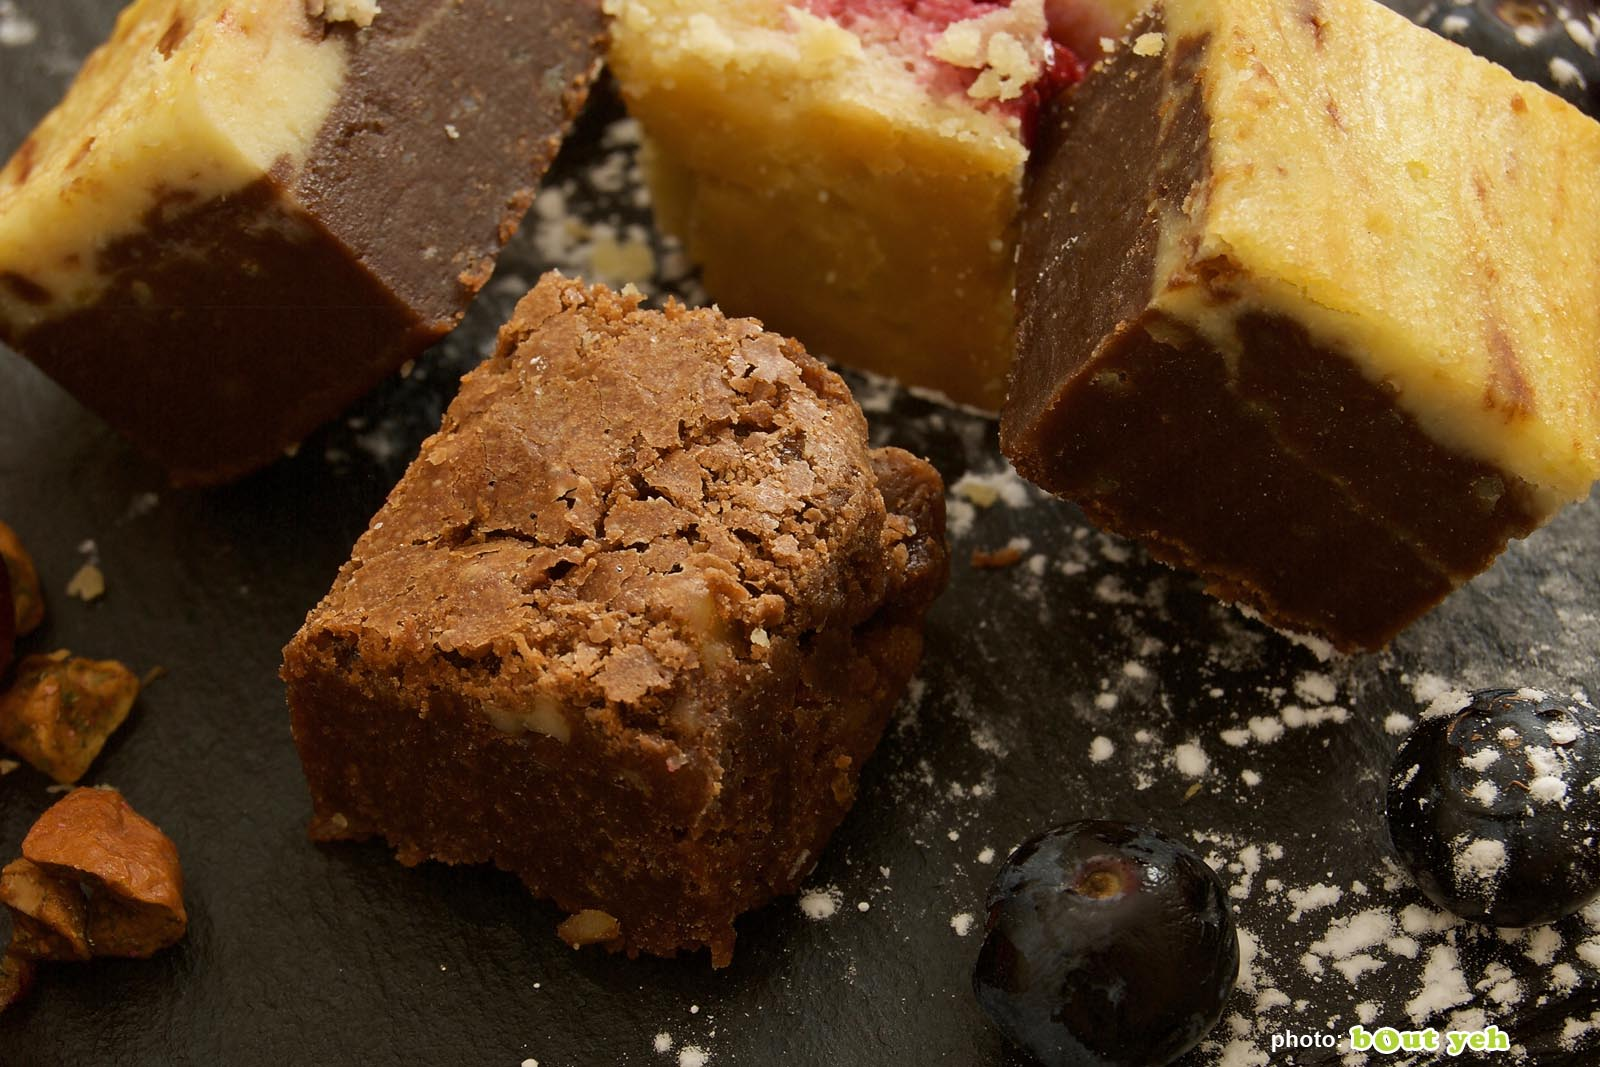 Food photographers Belfast portfolio photo 1374 - selection of traybakes